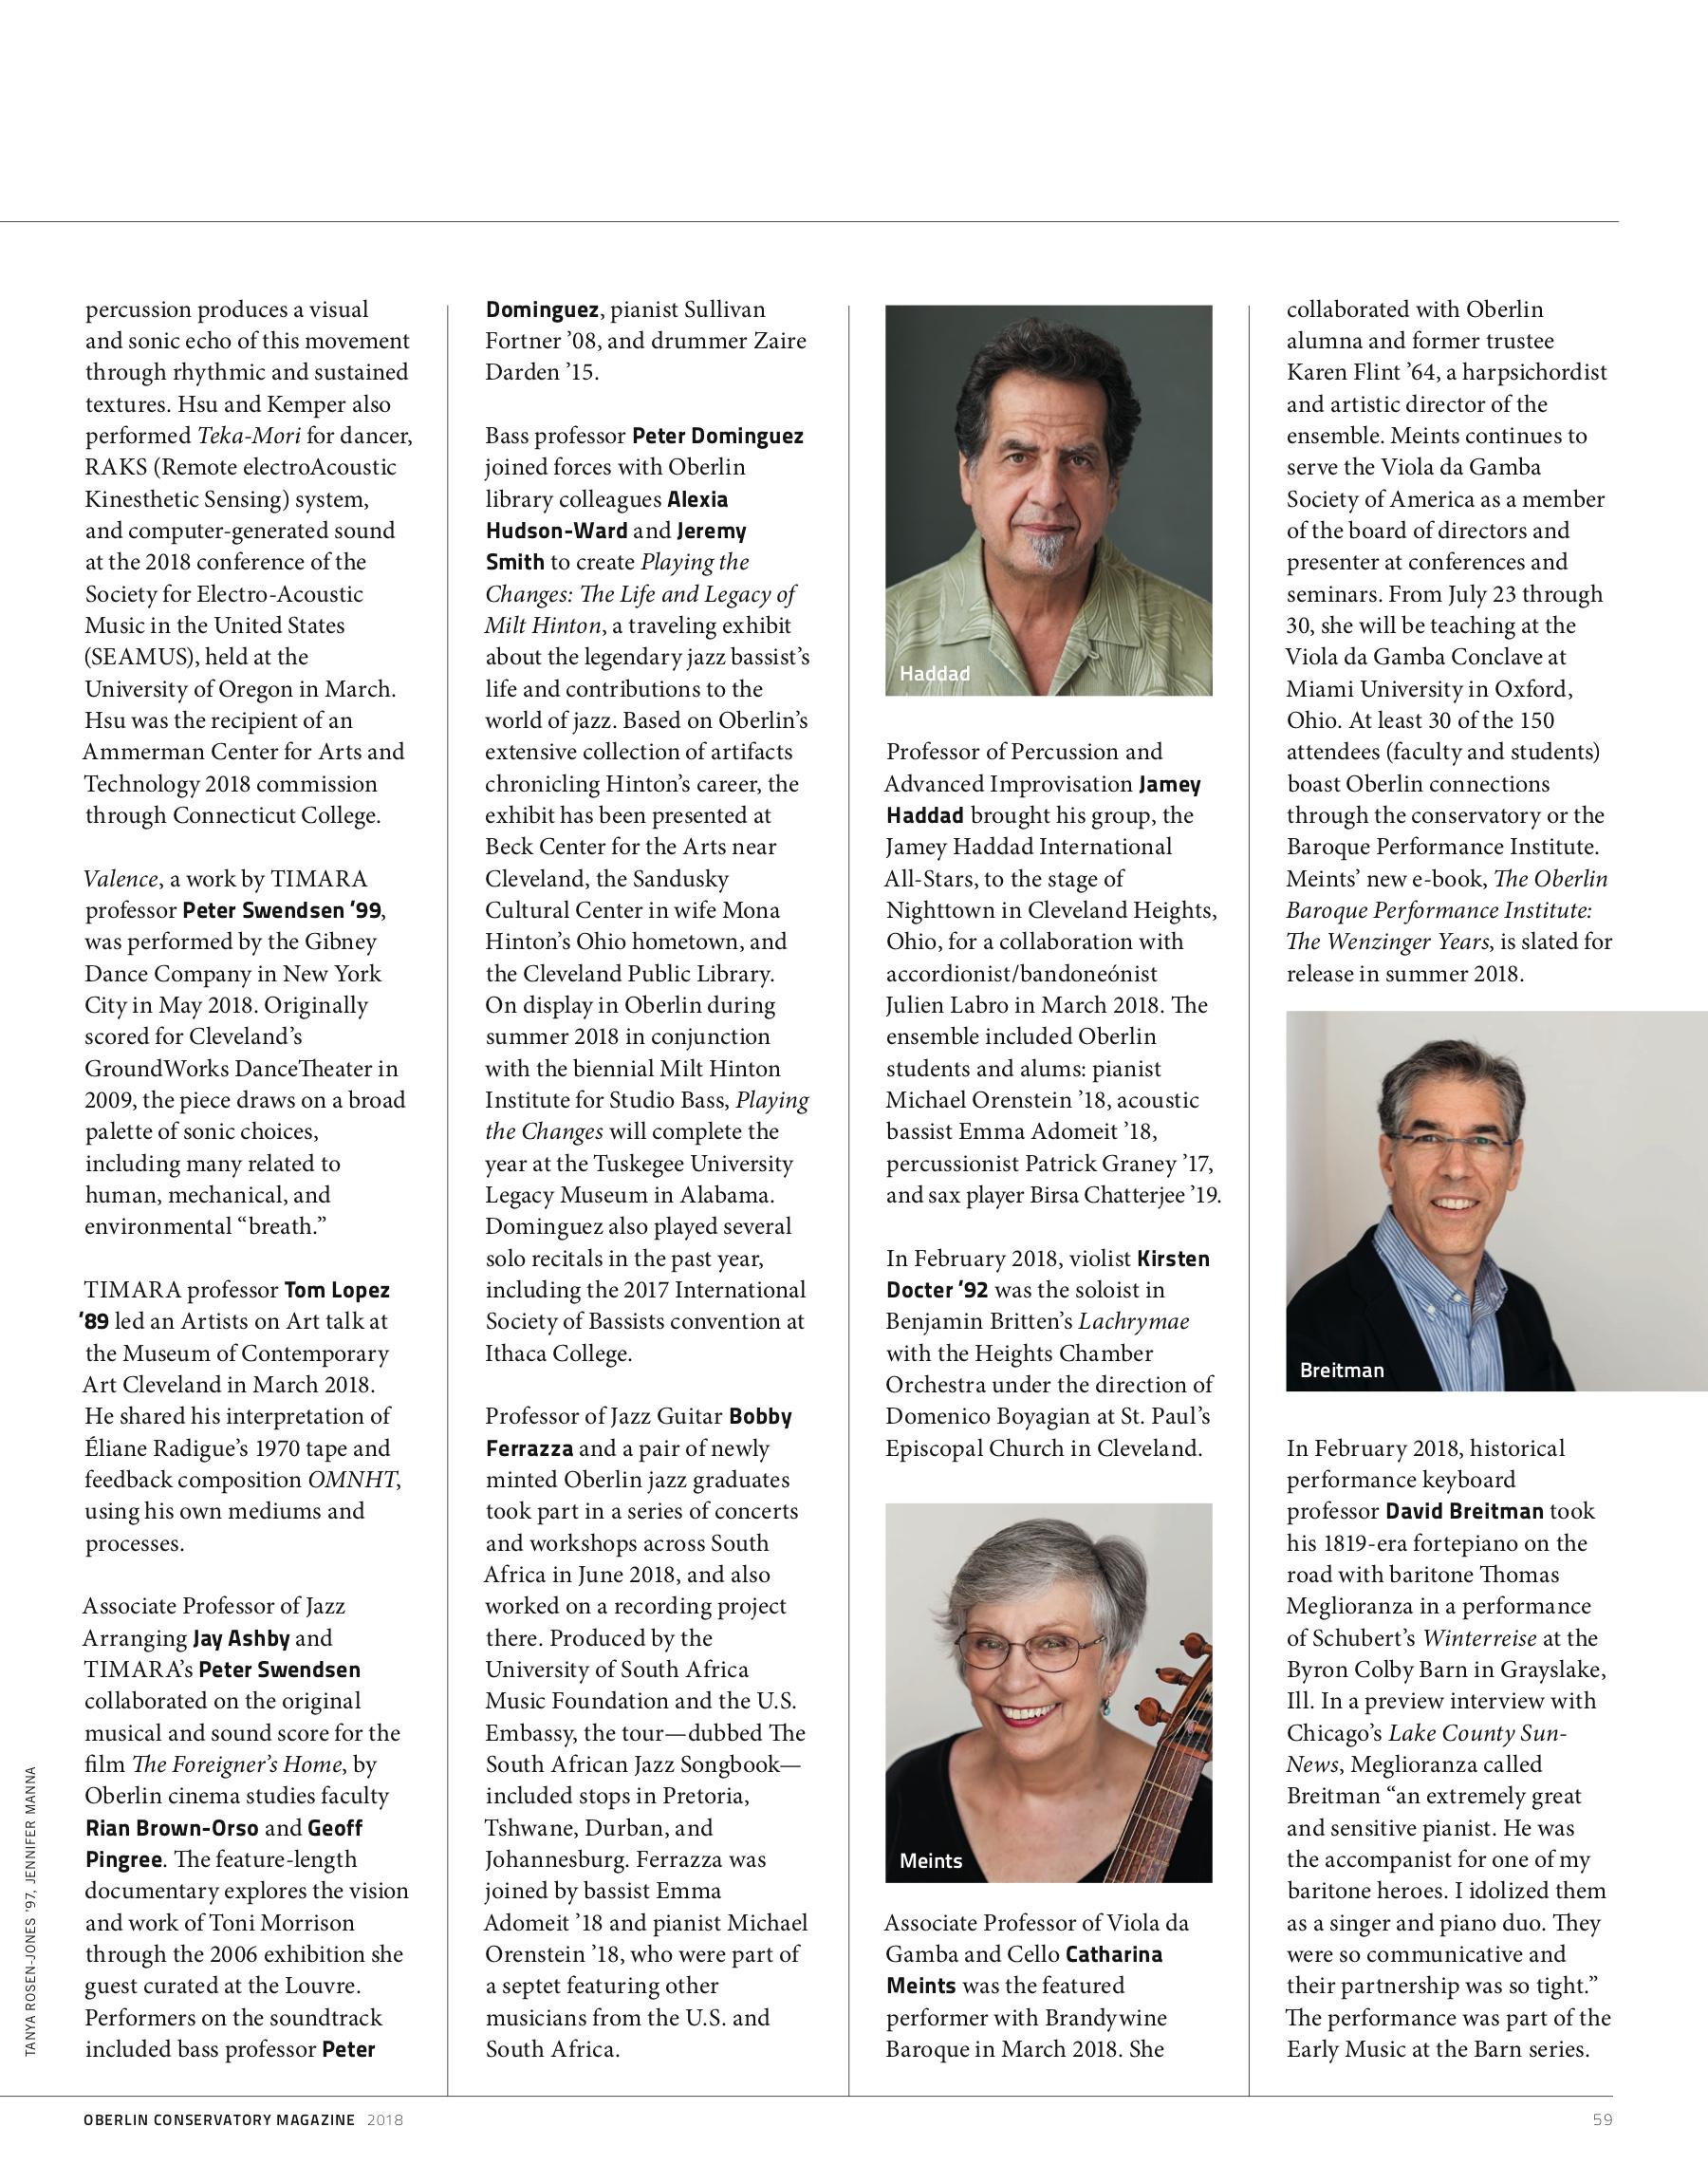 Oberlin Conservatory Magazine 2018